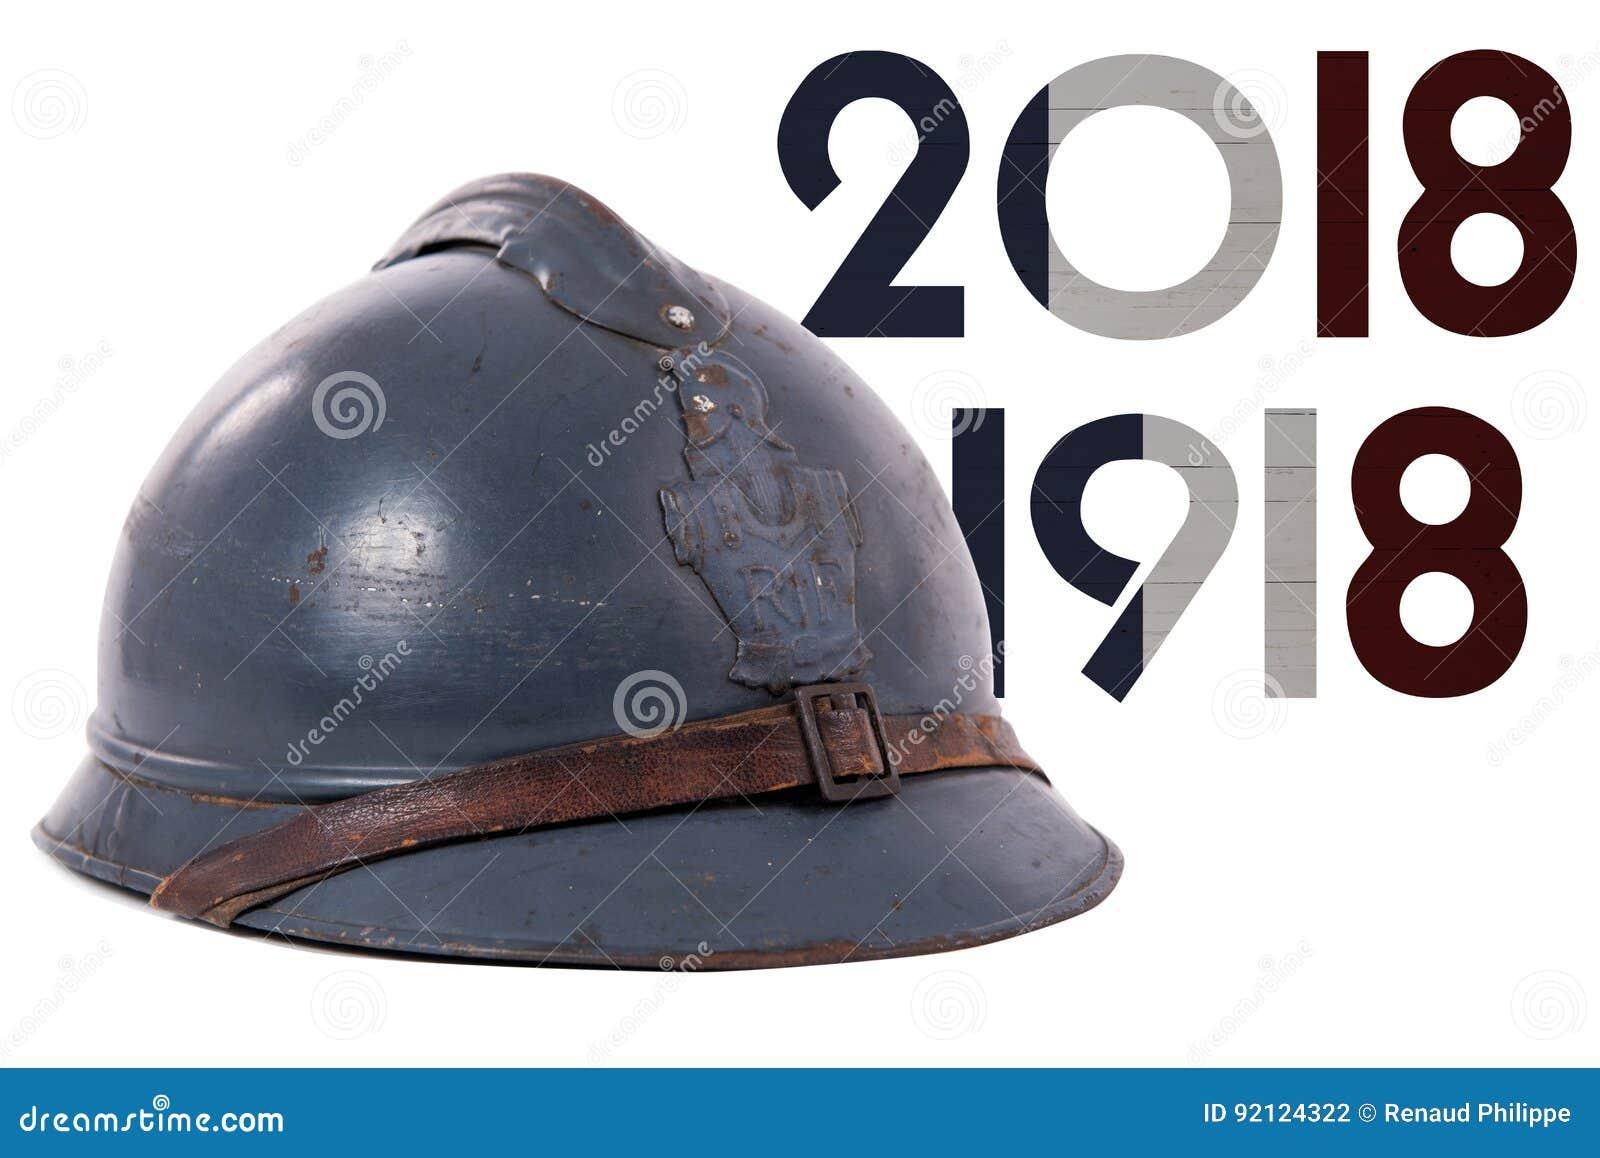 Capacete militar francês da primeira guerra mundial isolada no branco